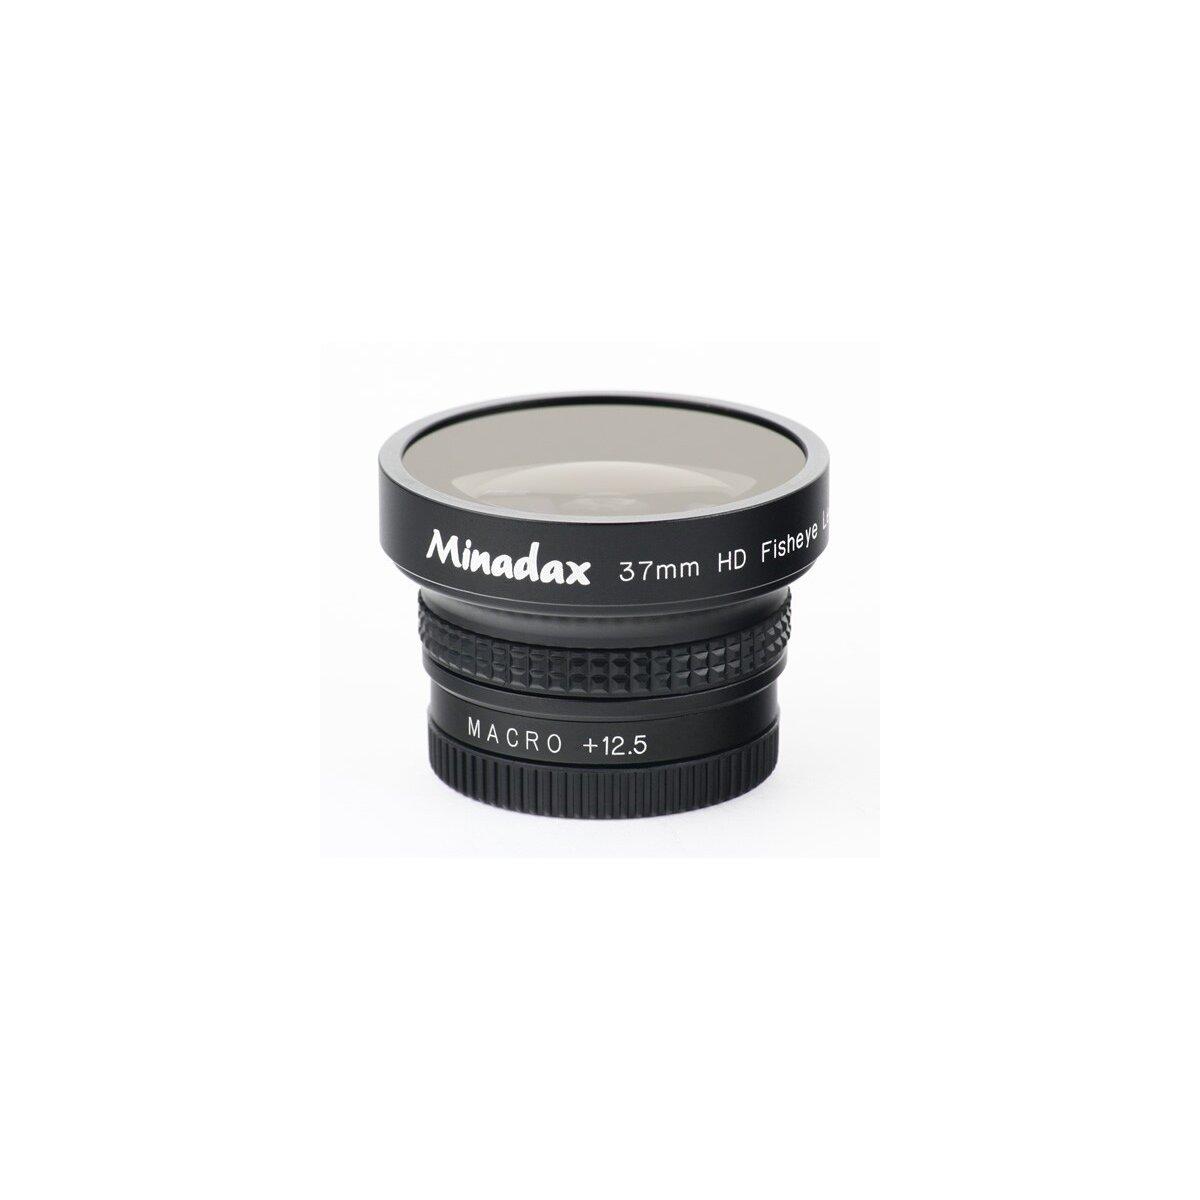 Minadax 0.42x Fisheye Vorsatz kompatibel mit Sony DSC-W30, DSC-W35, DSC-W40, DSC-W50, DSC-W55, DSC-W70